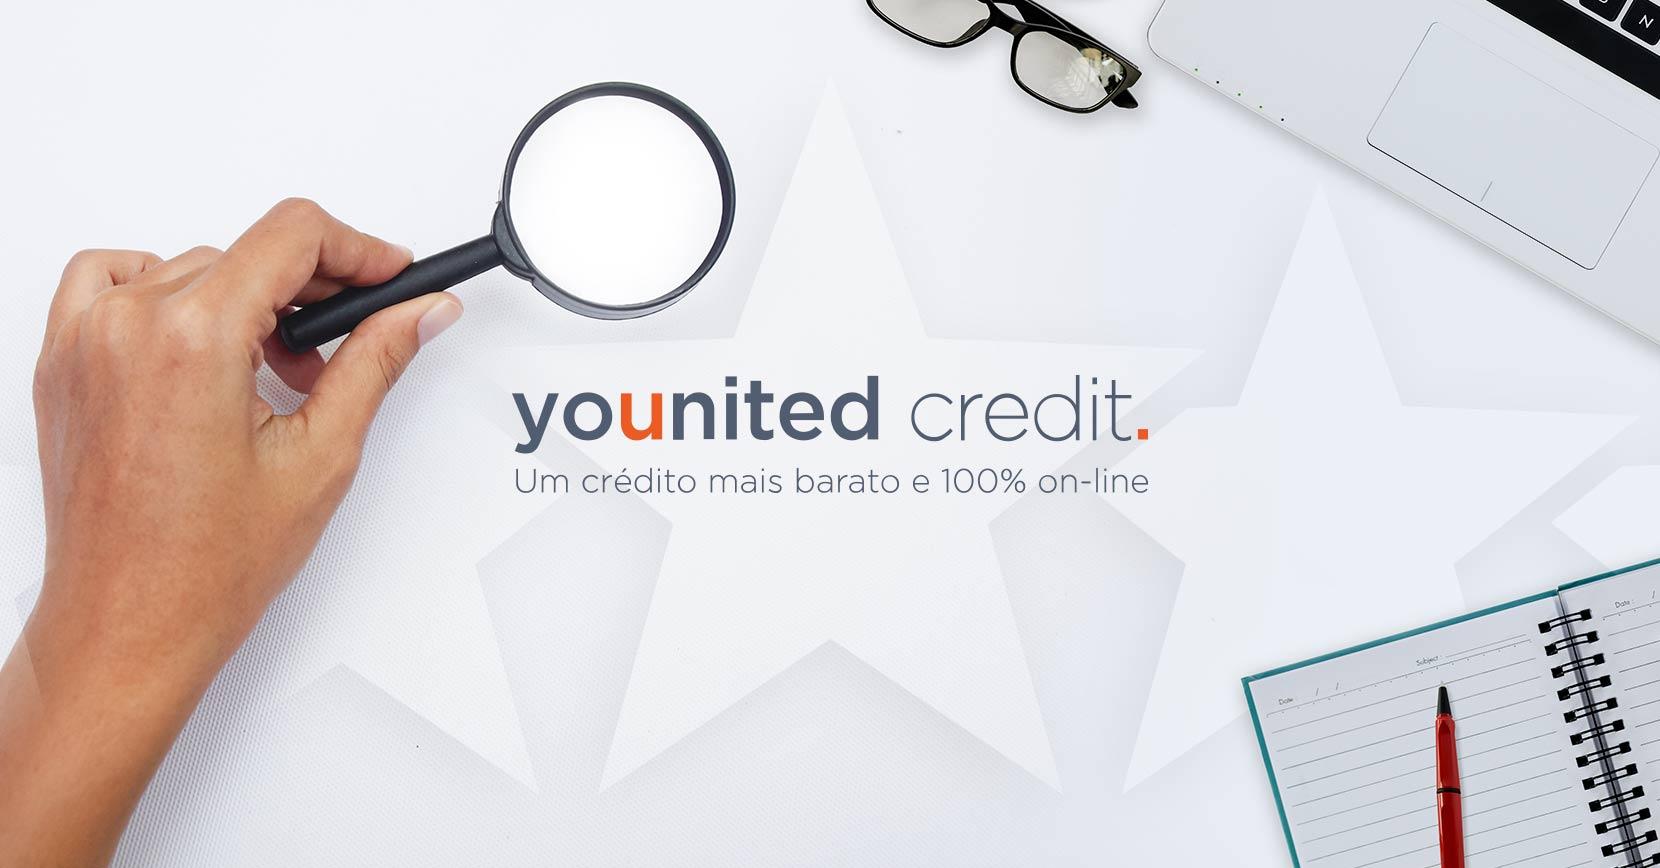 Younited credit é credível